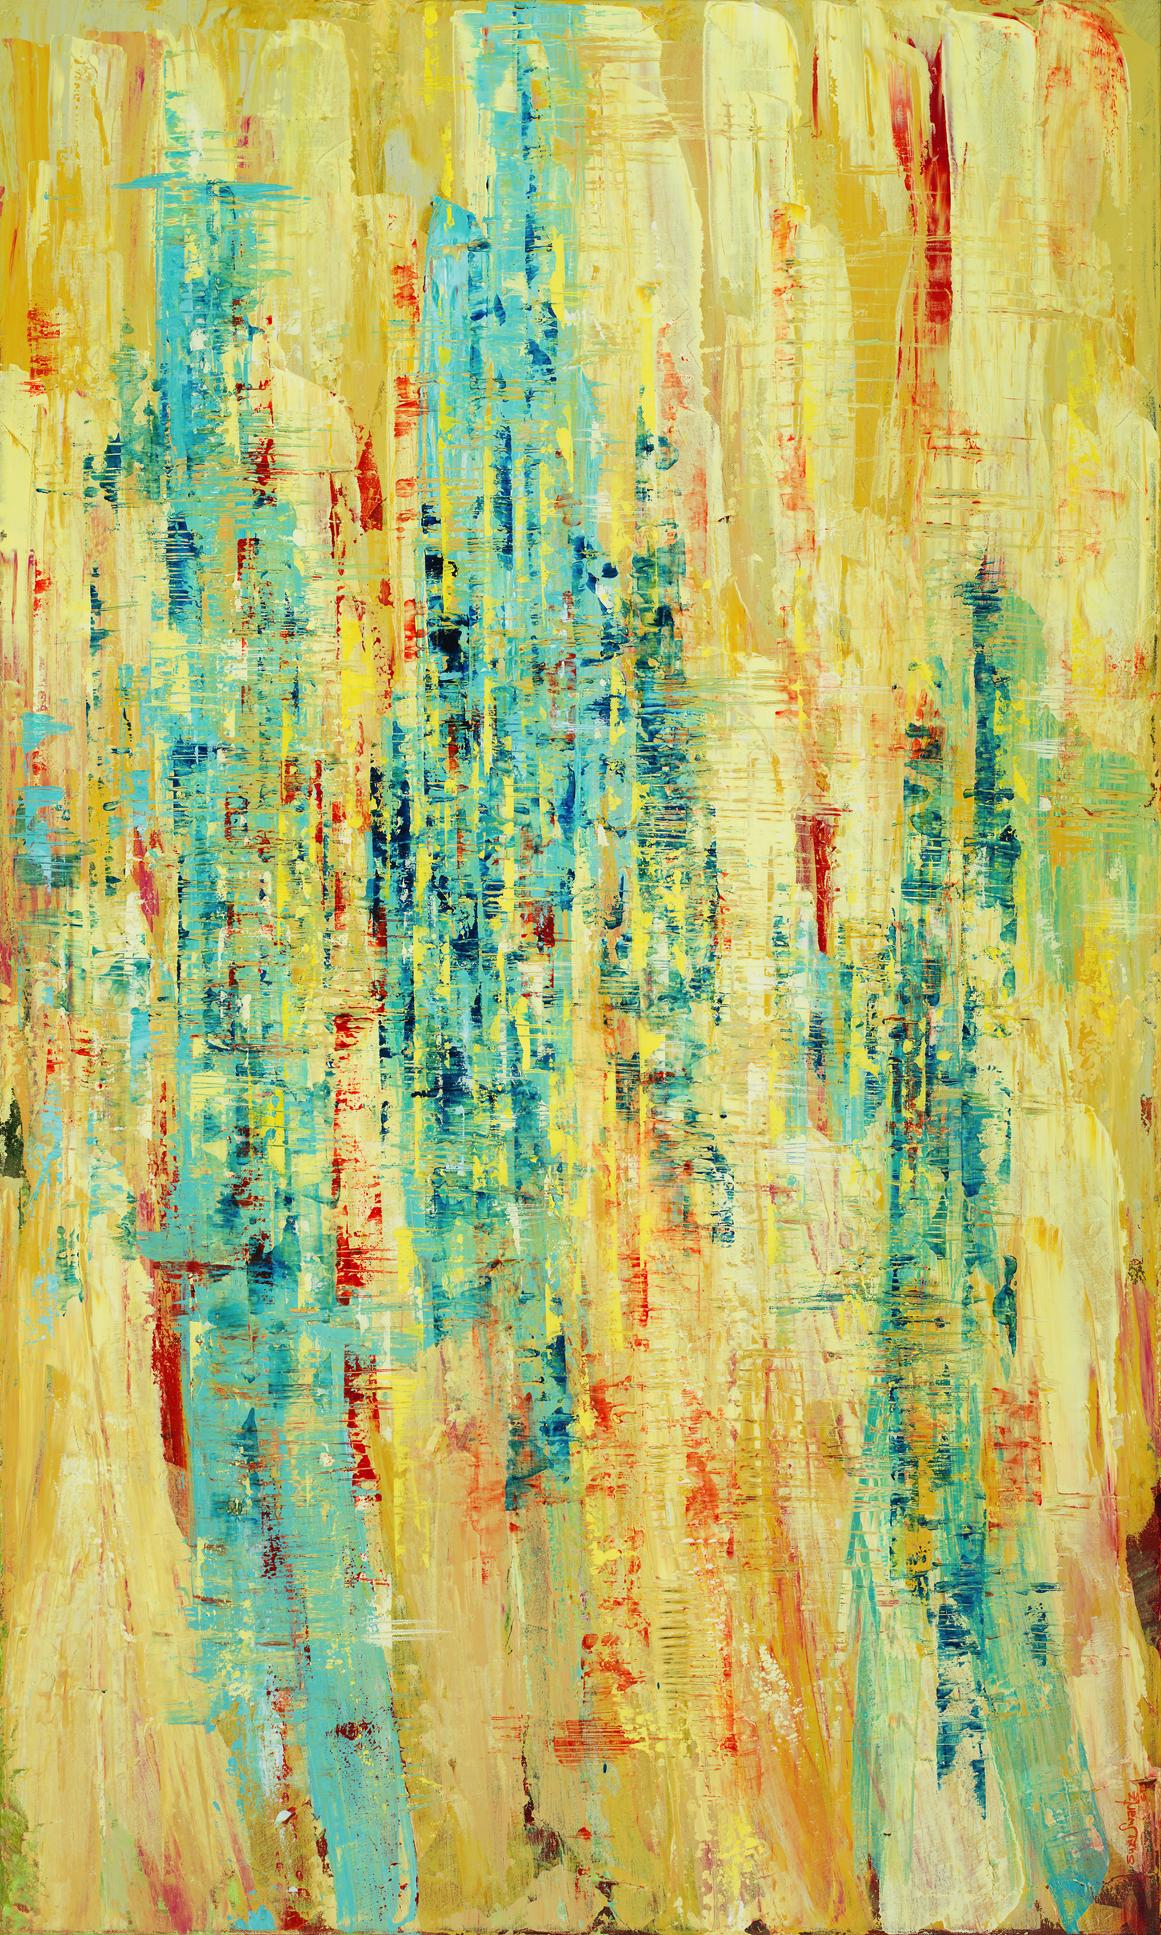 Landscape of Resonances 004